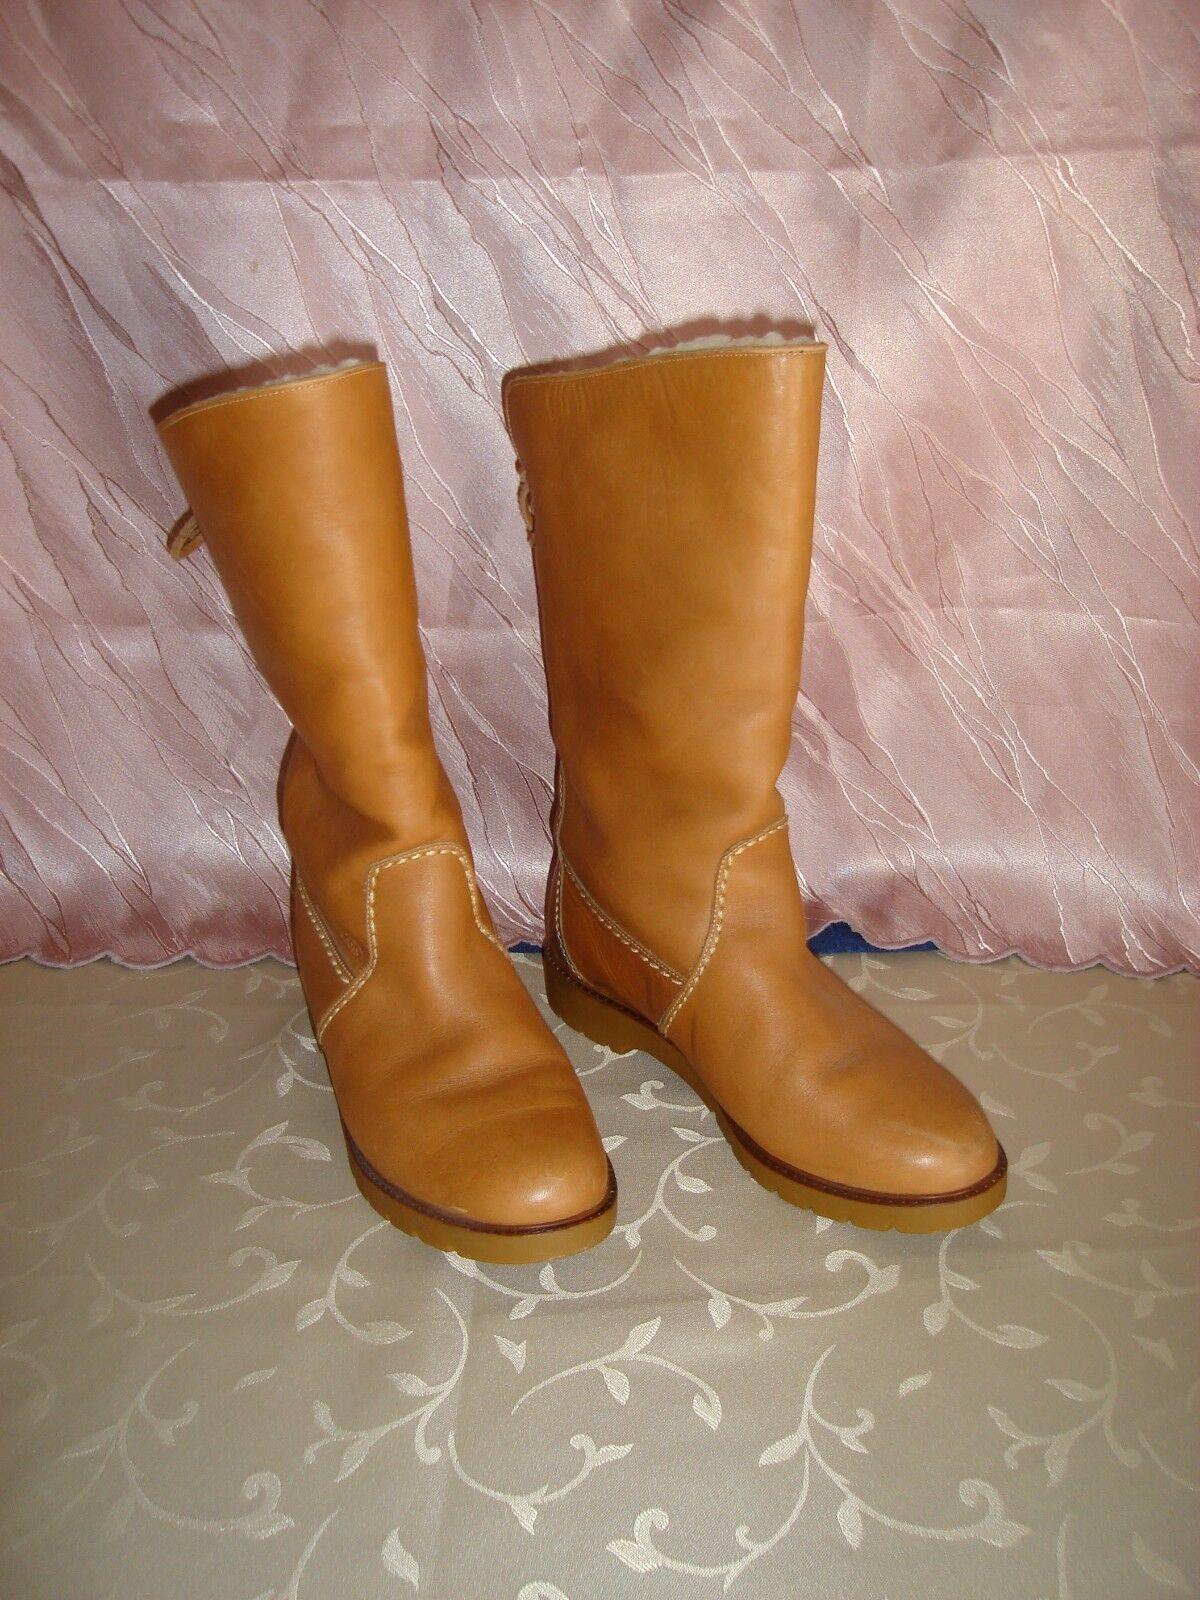 Camel Stiefel Damen Schuhe,Stiefel,Winterstiefel, Echtes Leder, Gefüttert Gr.40